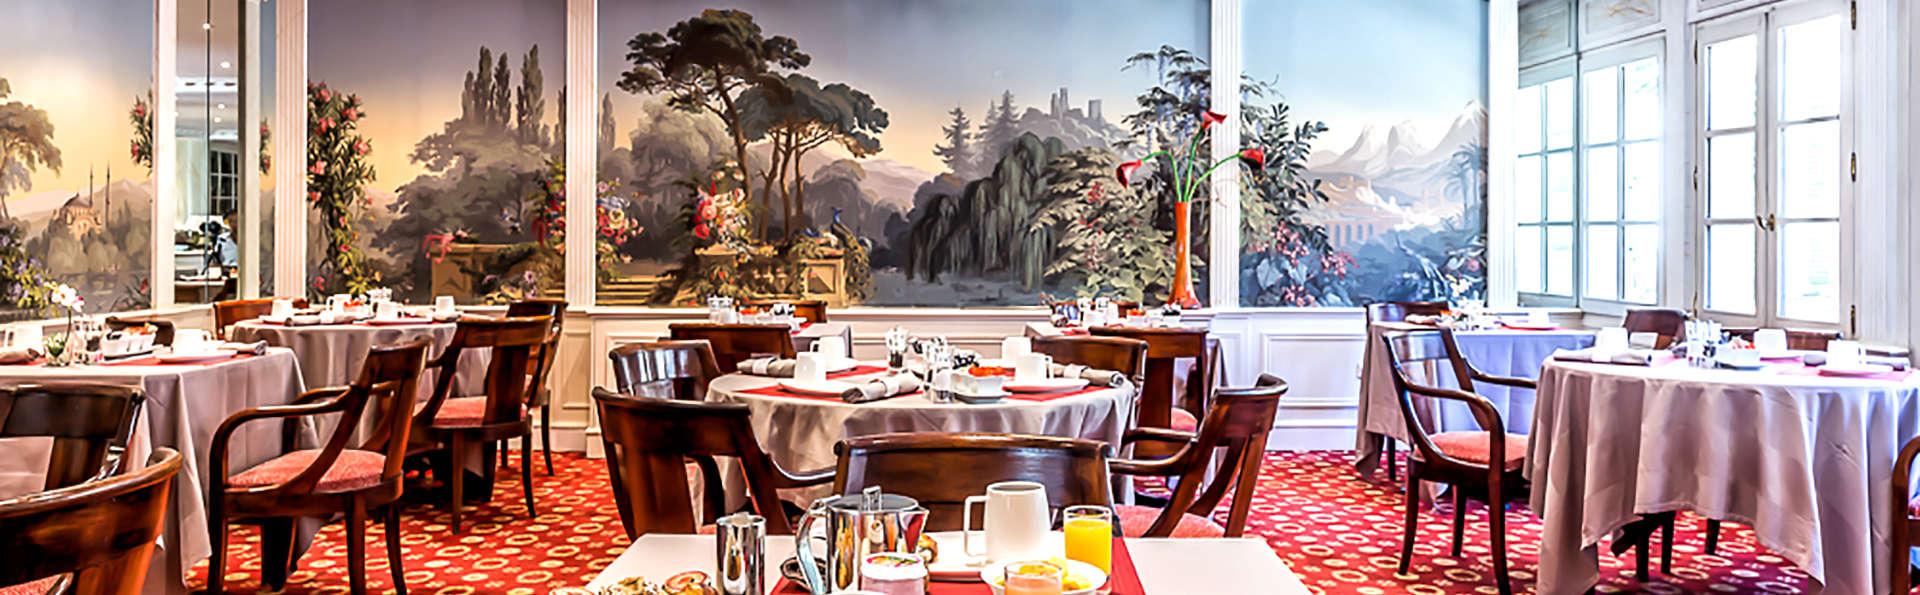 L'Aigle Noir Hôtel - Edit_Restaurant.jpg